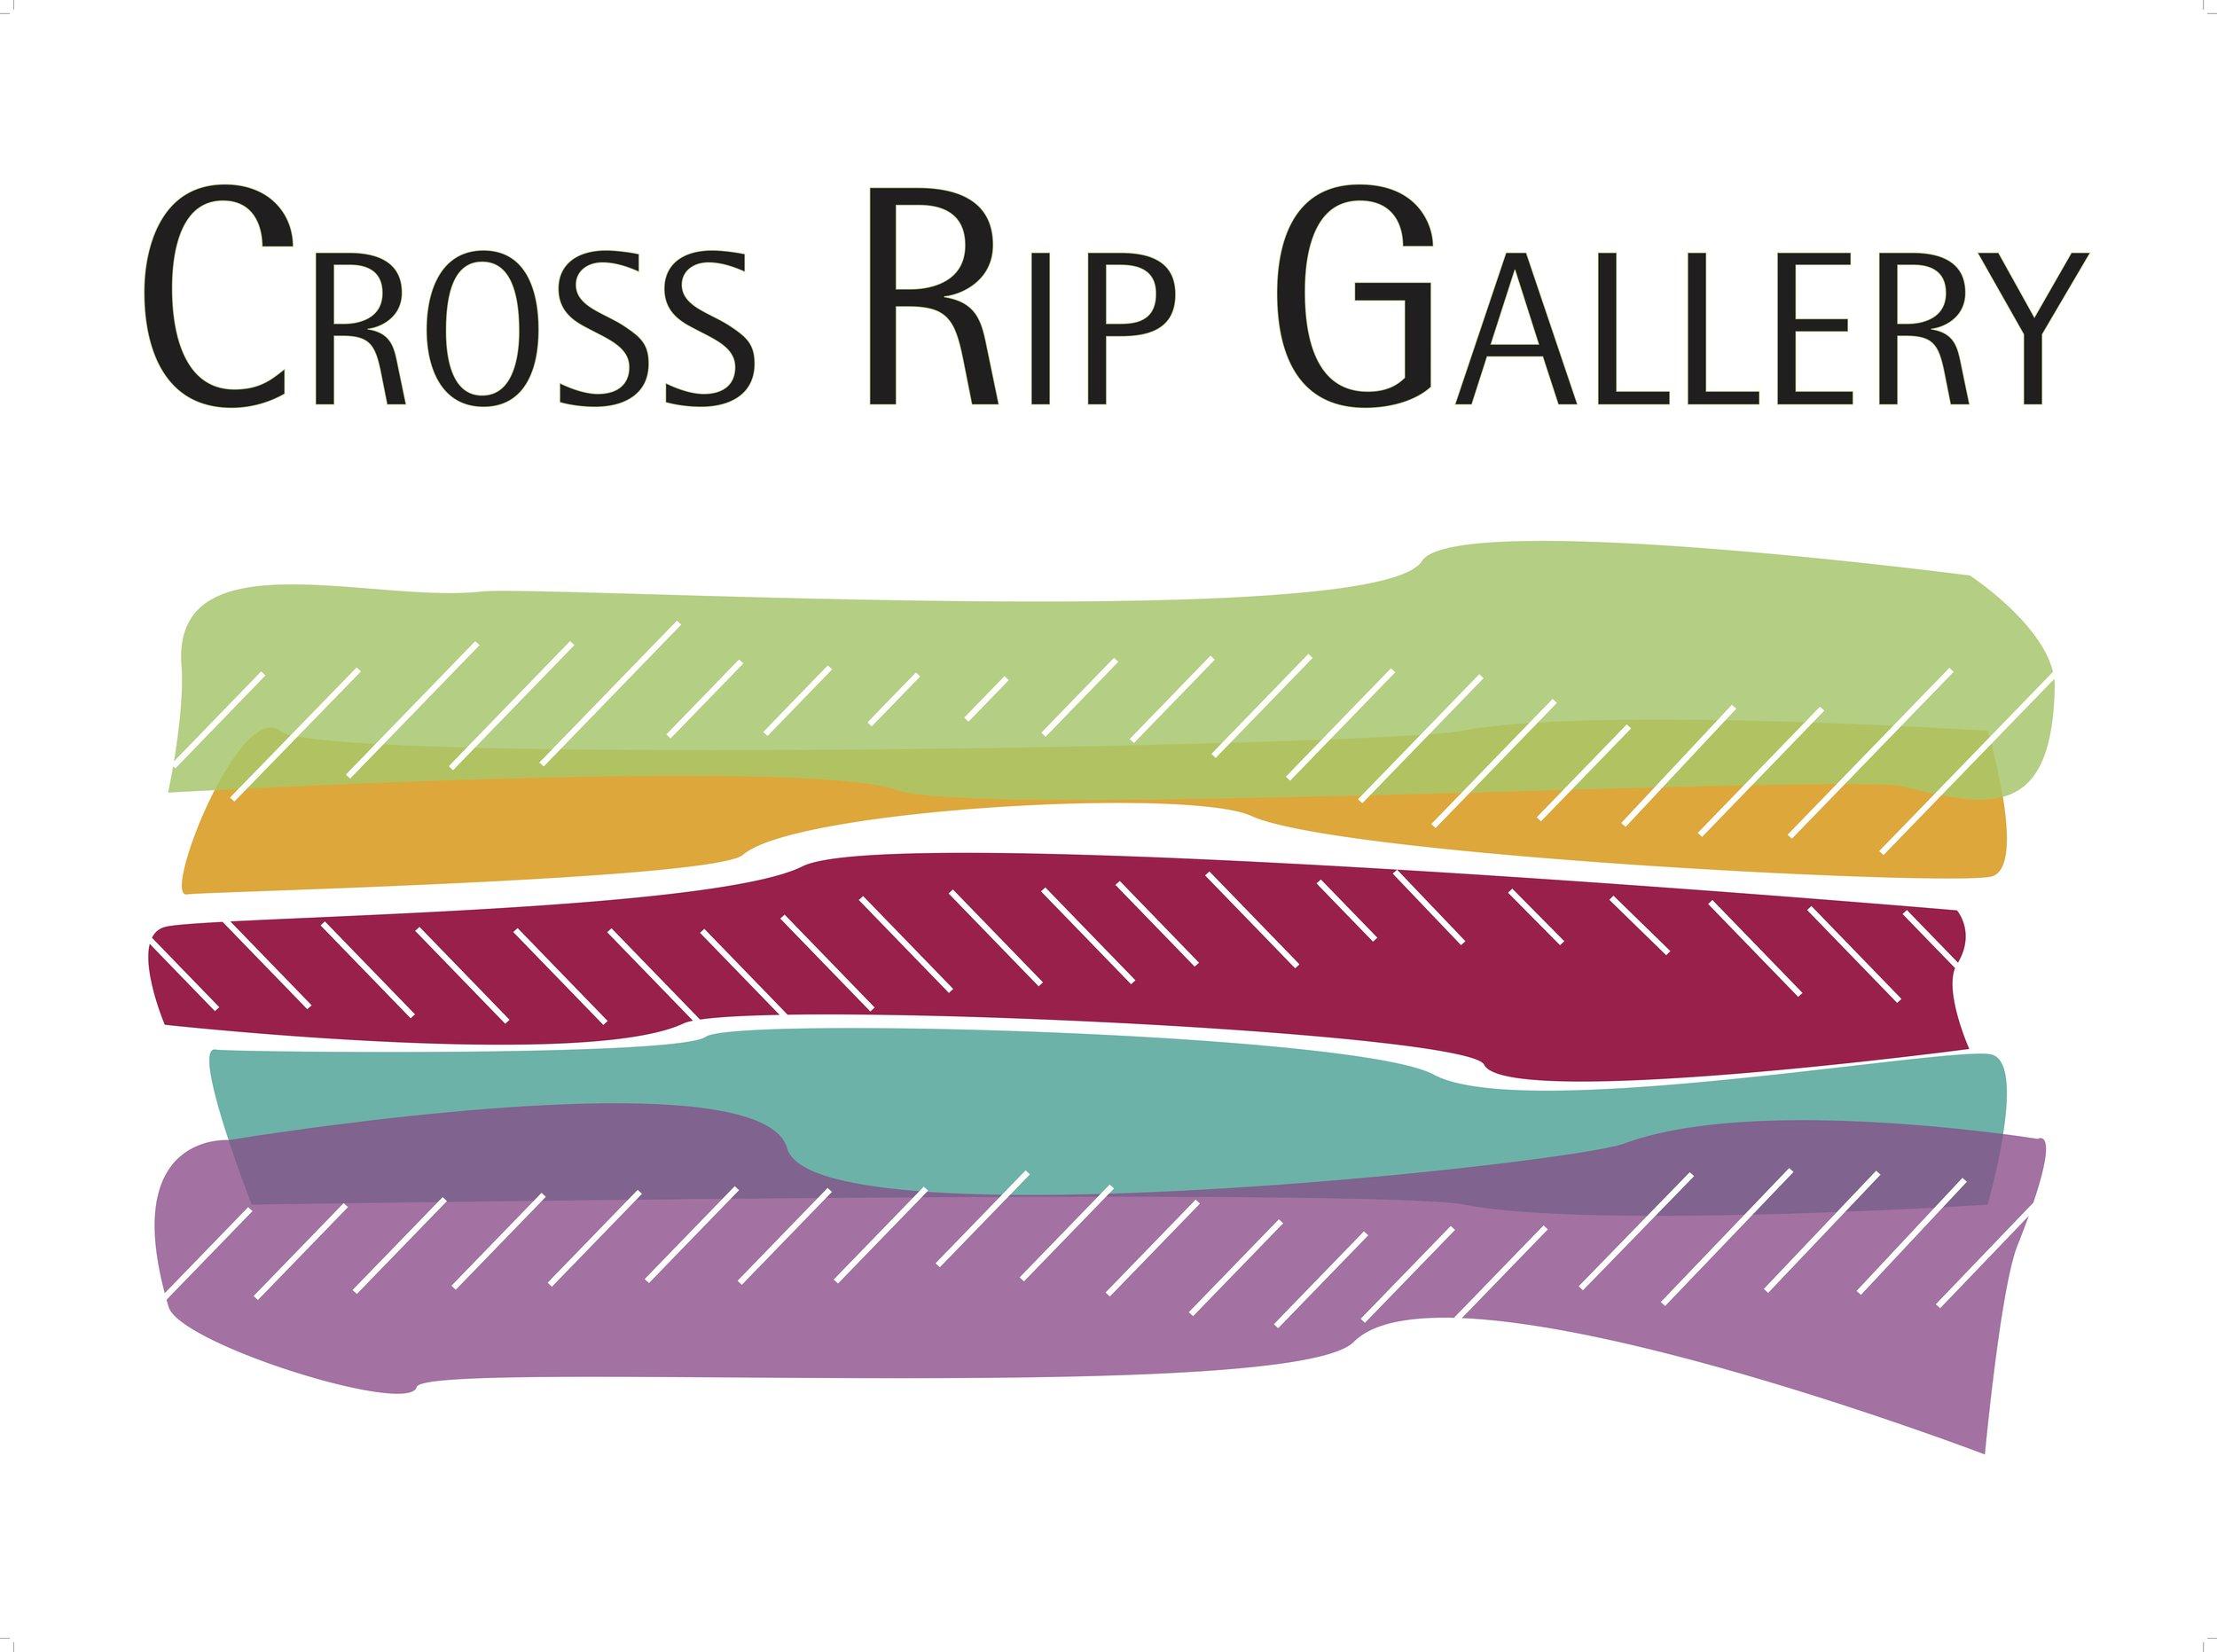 Cross Rip Gallery Sign TO PRINT.jpg